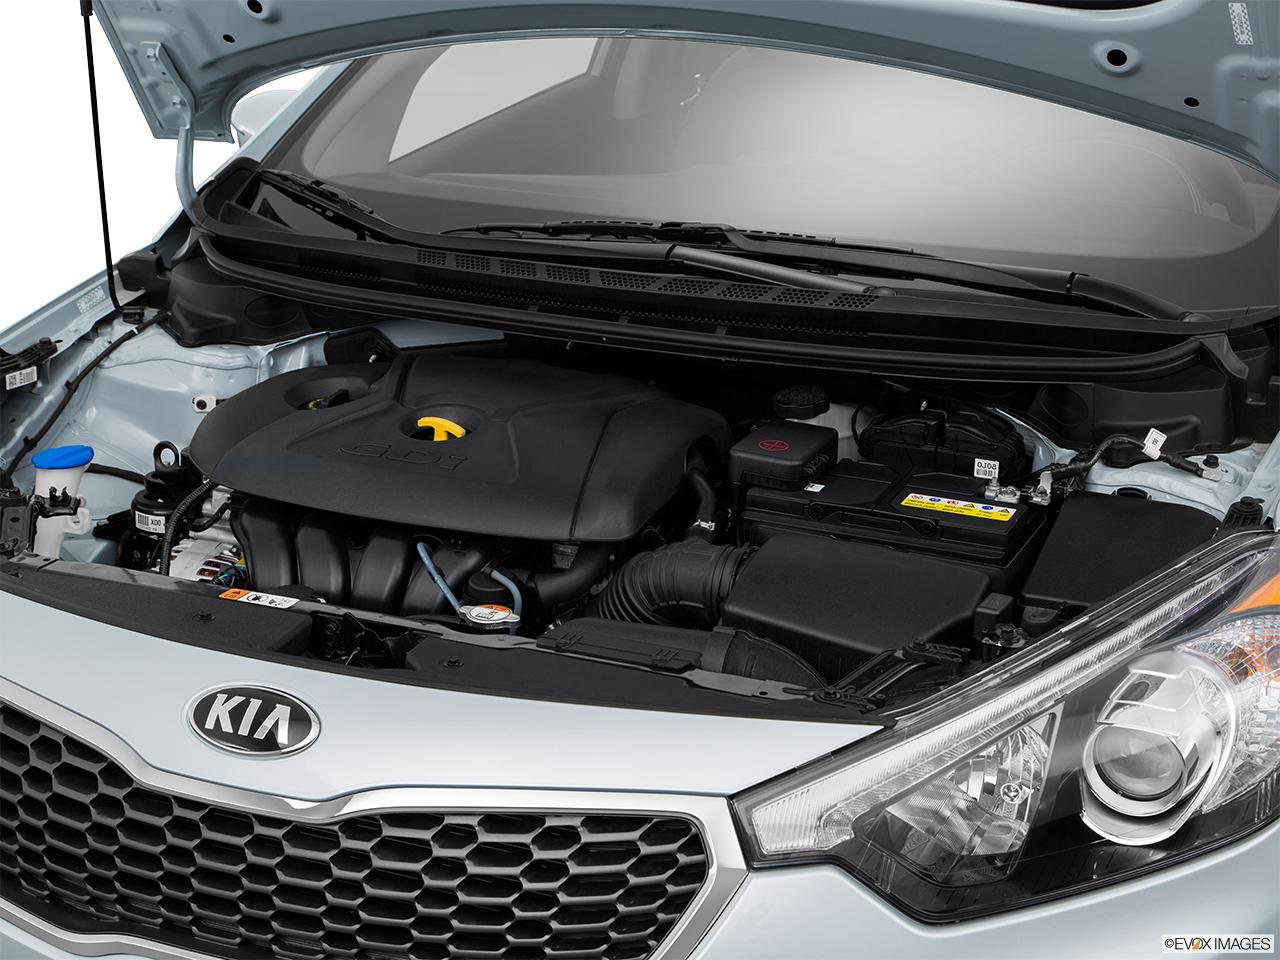 List Of Car Insurance Companies In Ksa